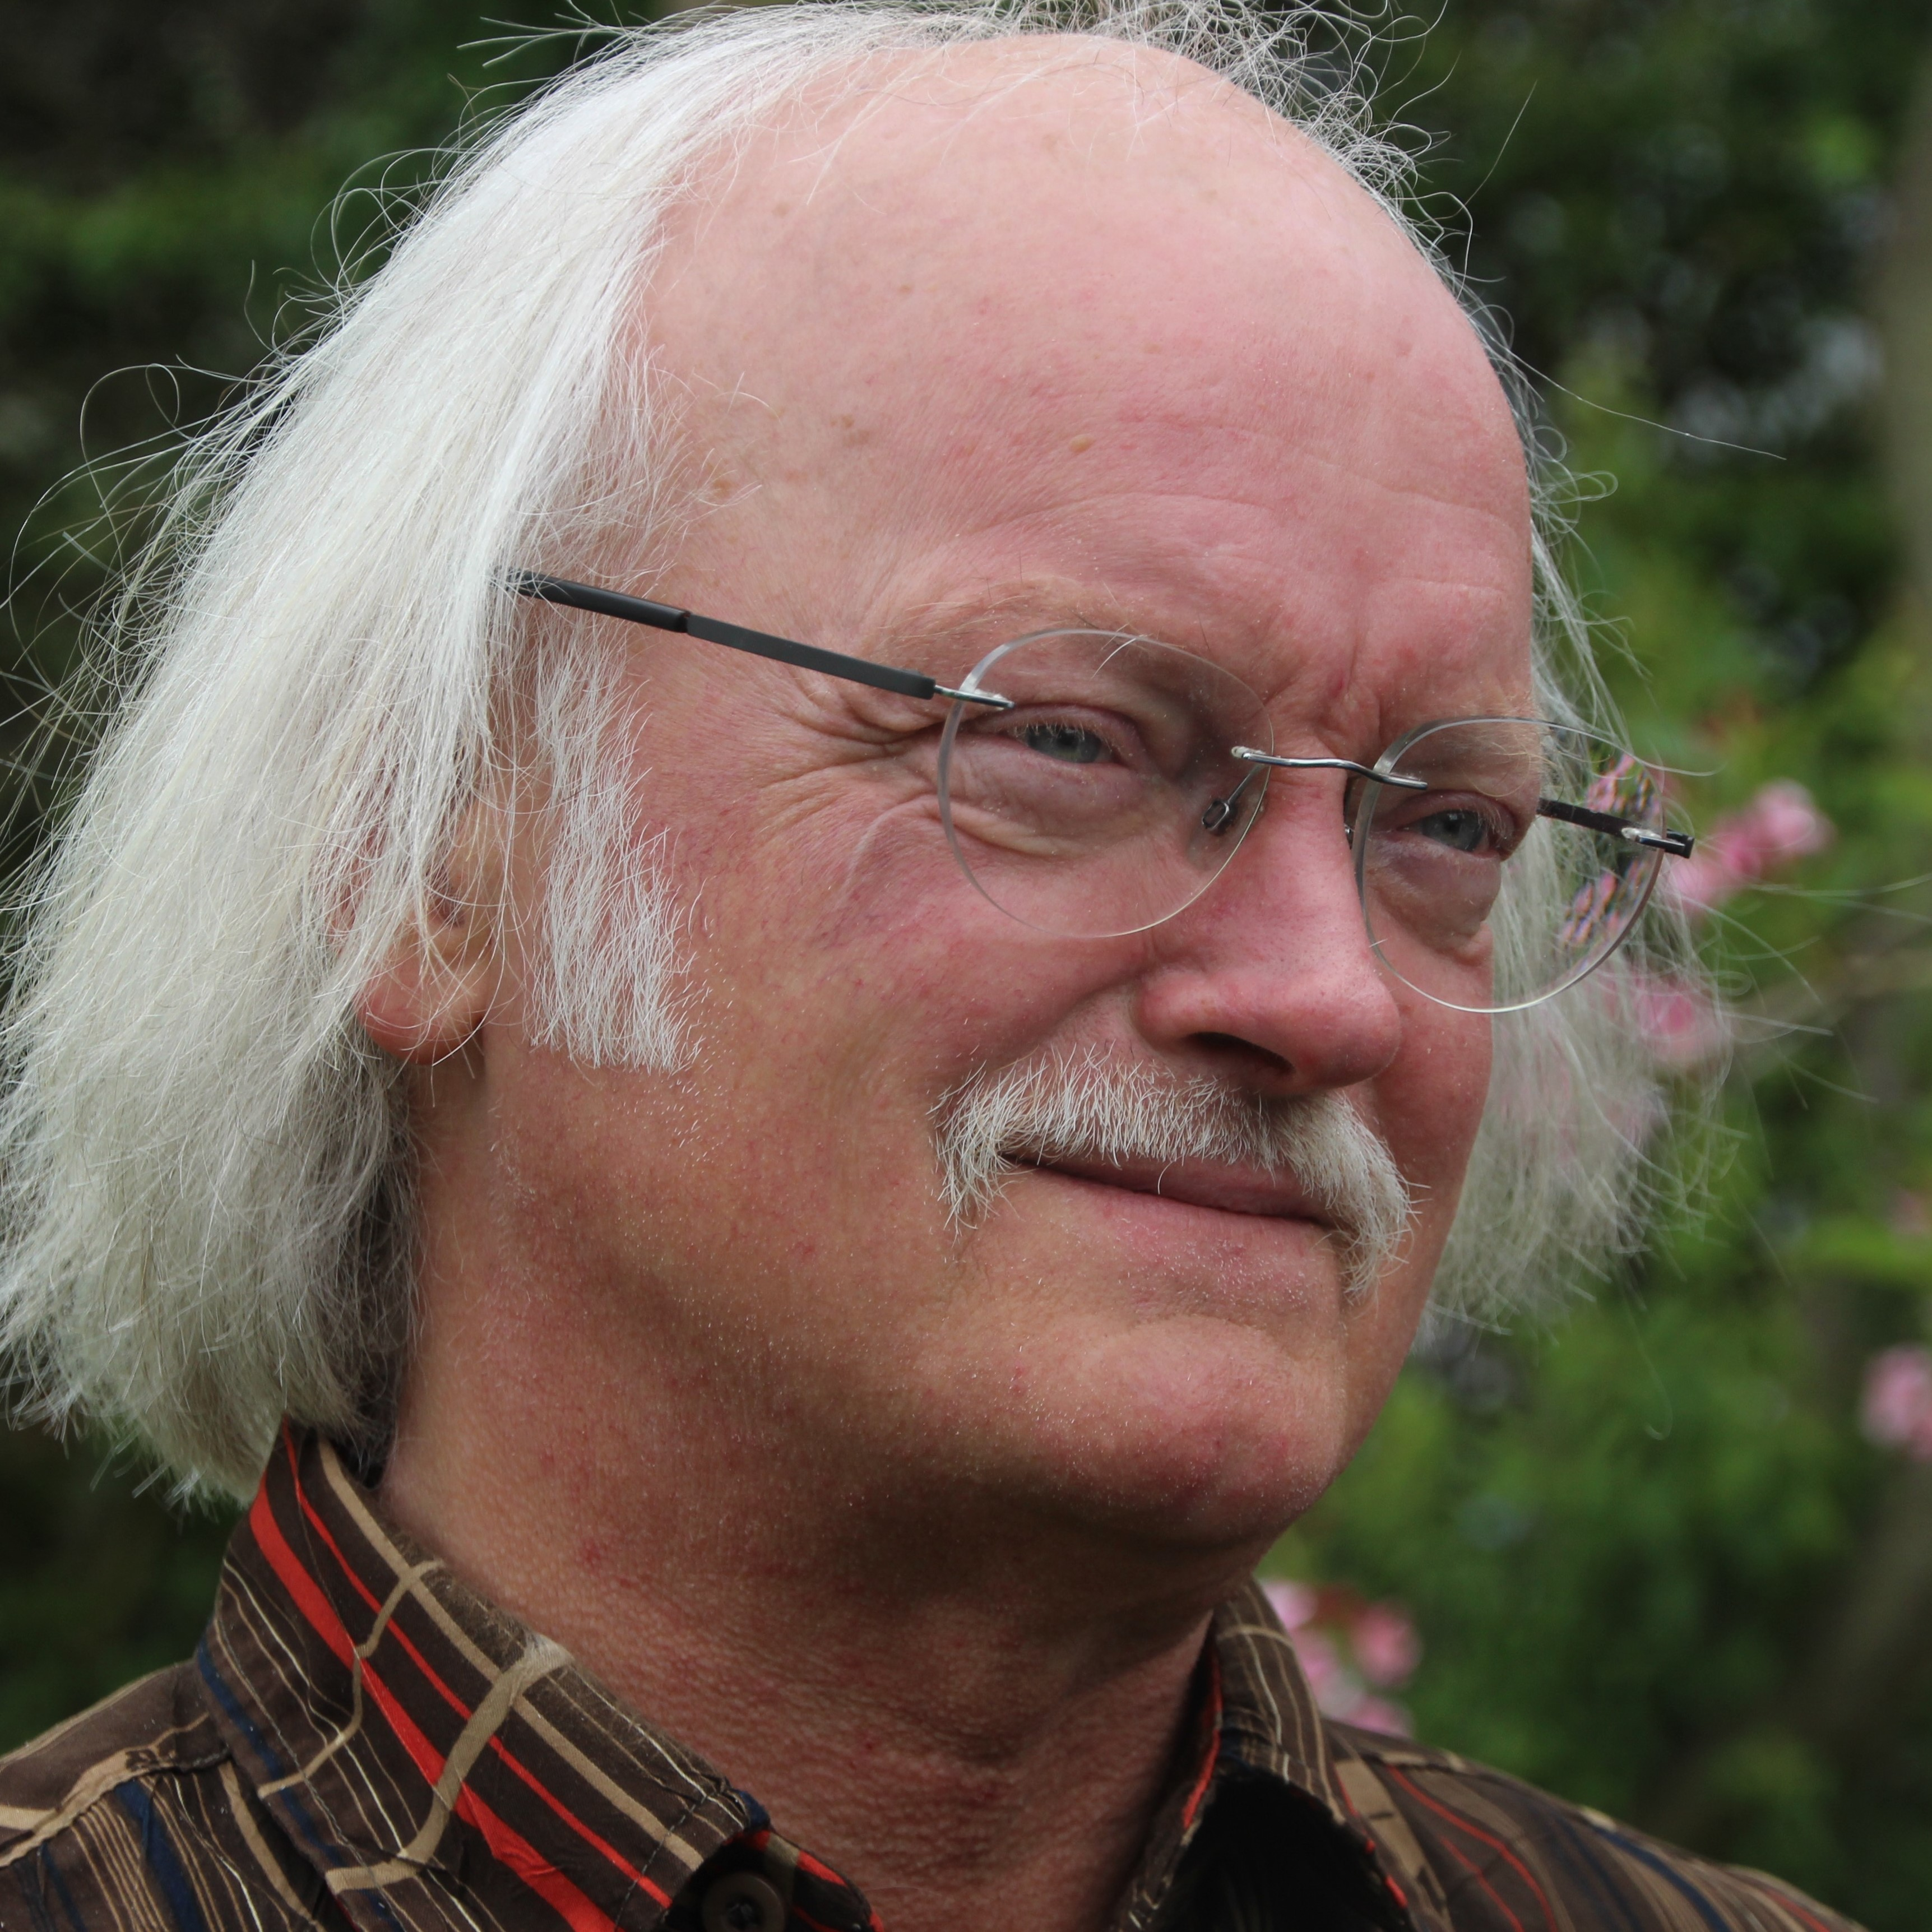 Svend Åge Petersen